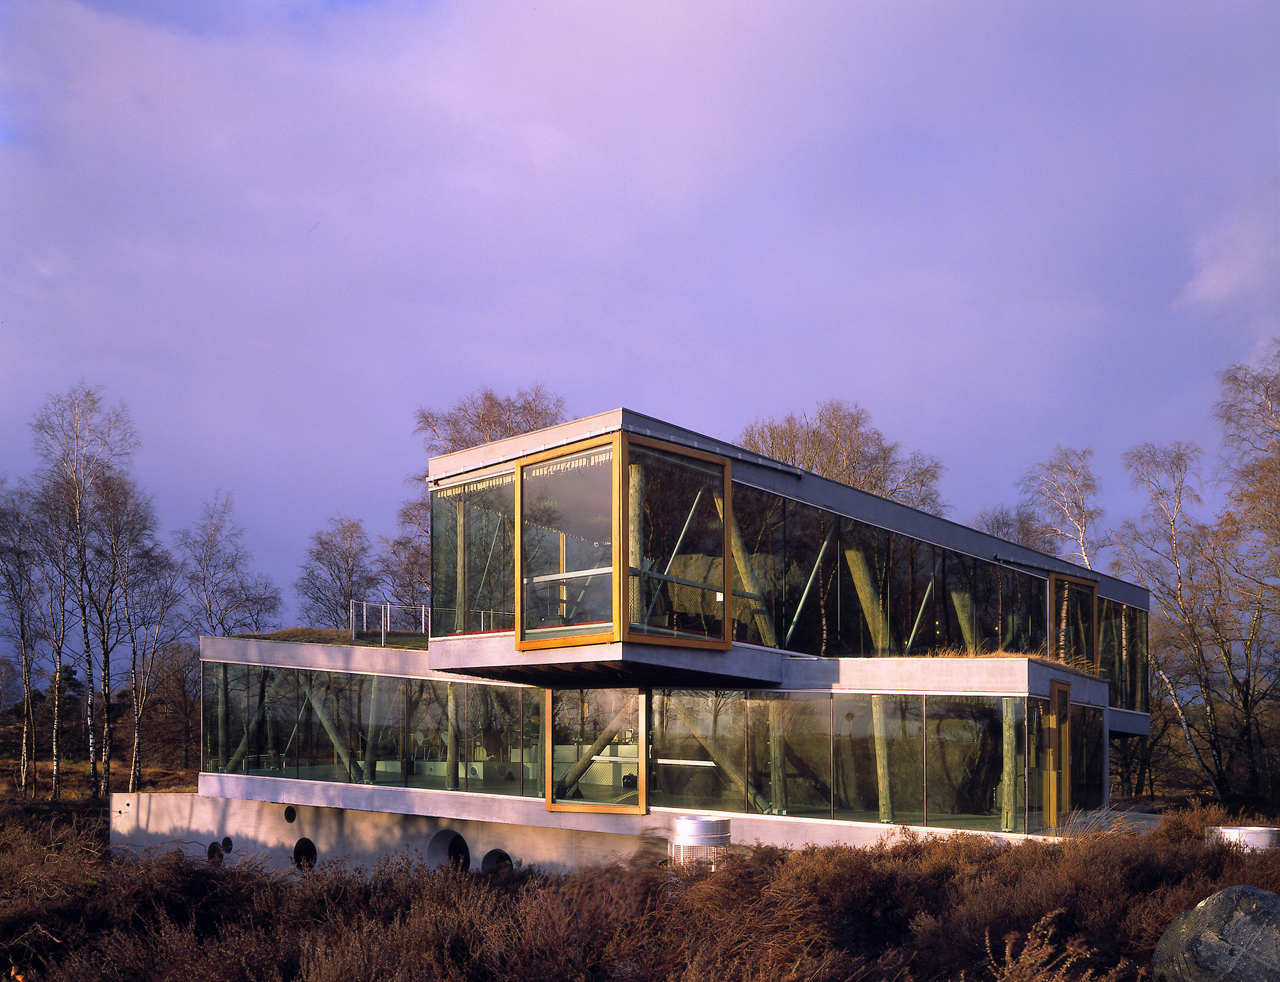 Flashback: Posbank Pavilion / de architectegroep, rijnboutt ruijssenaars hendriks van gamerenmastenbroek bv, © Christian Richters